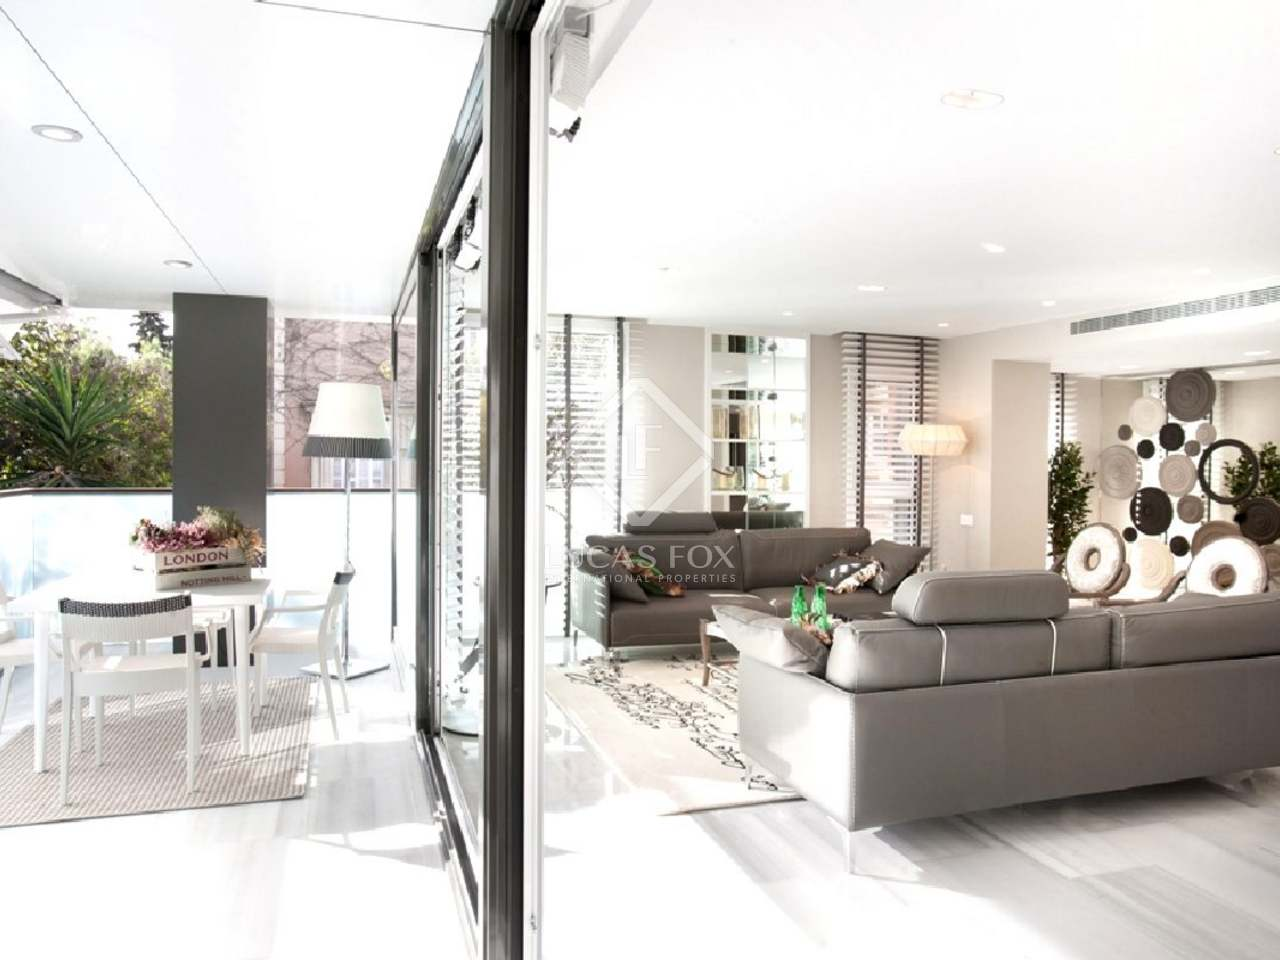 appartement de luxe en vente la zona alta de barcelone. Black Bedroom Furniture Sets. Home Design Ideas